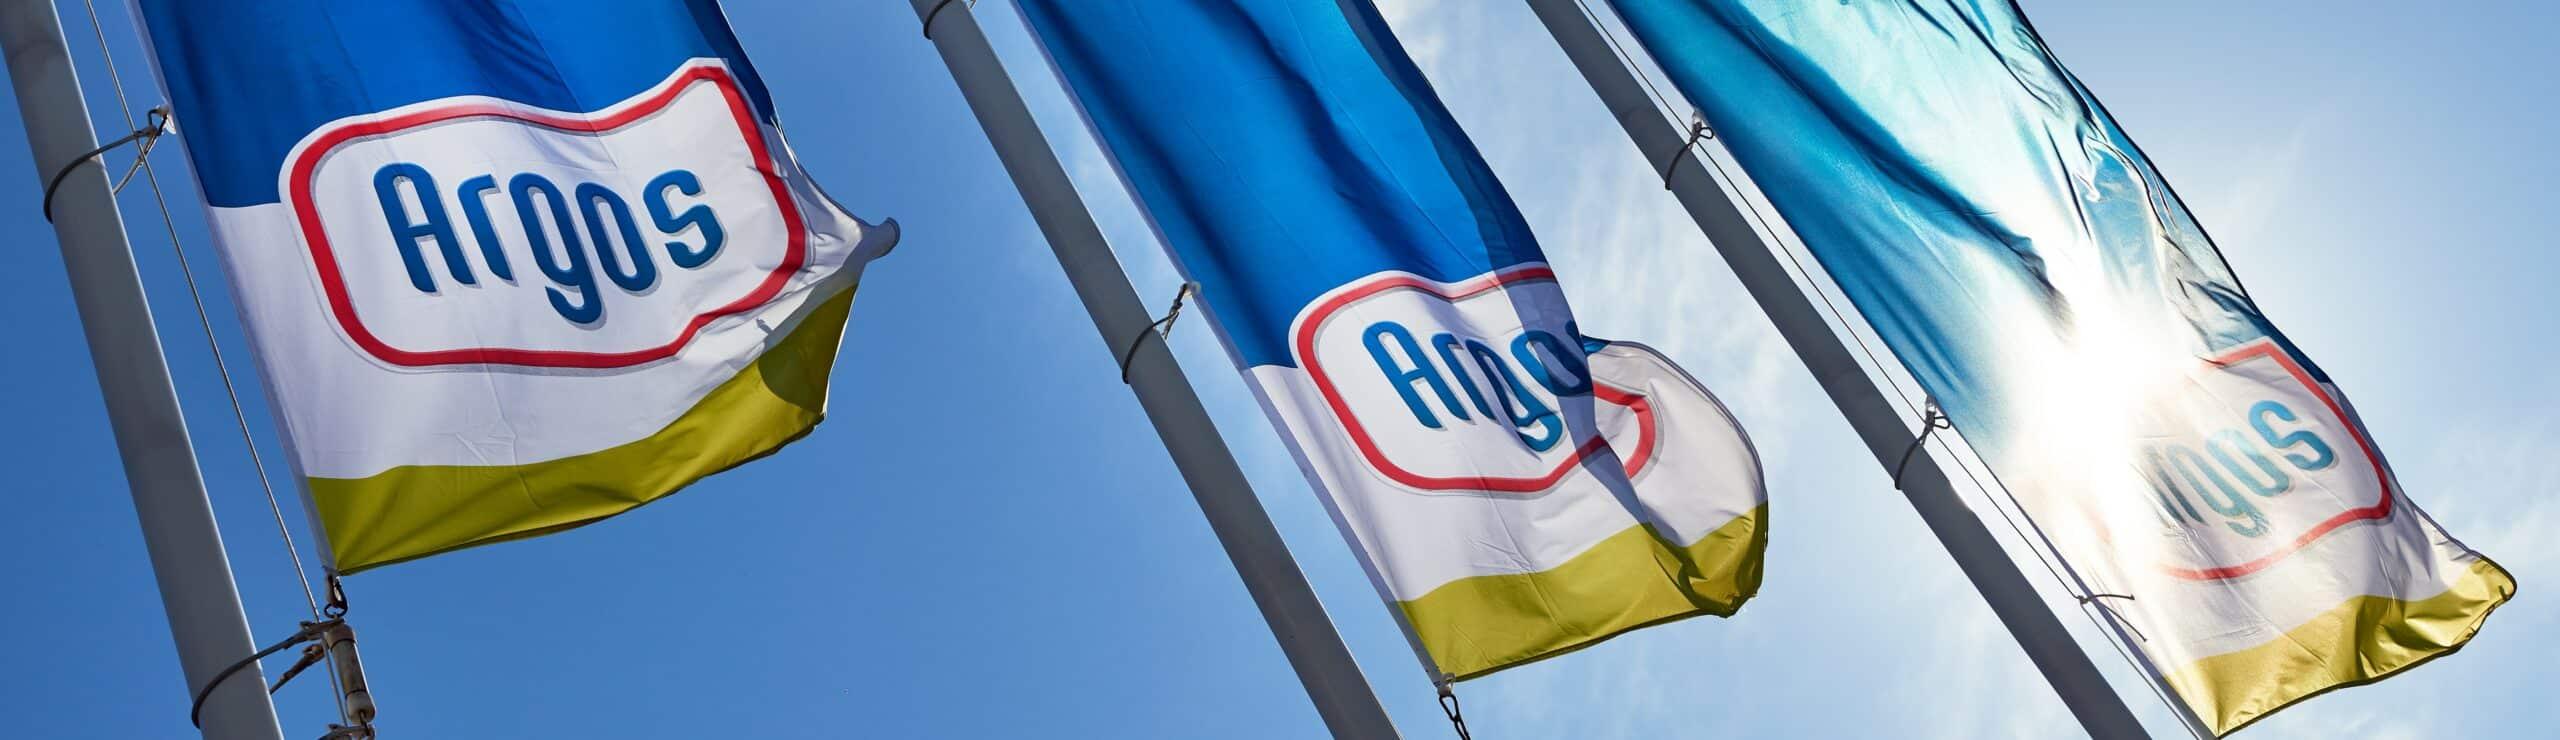 200ste locatie Argos